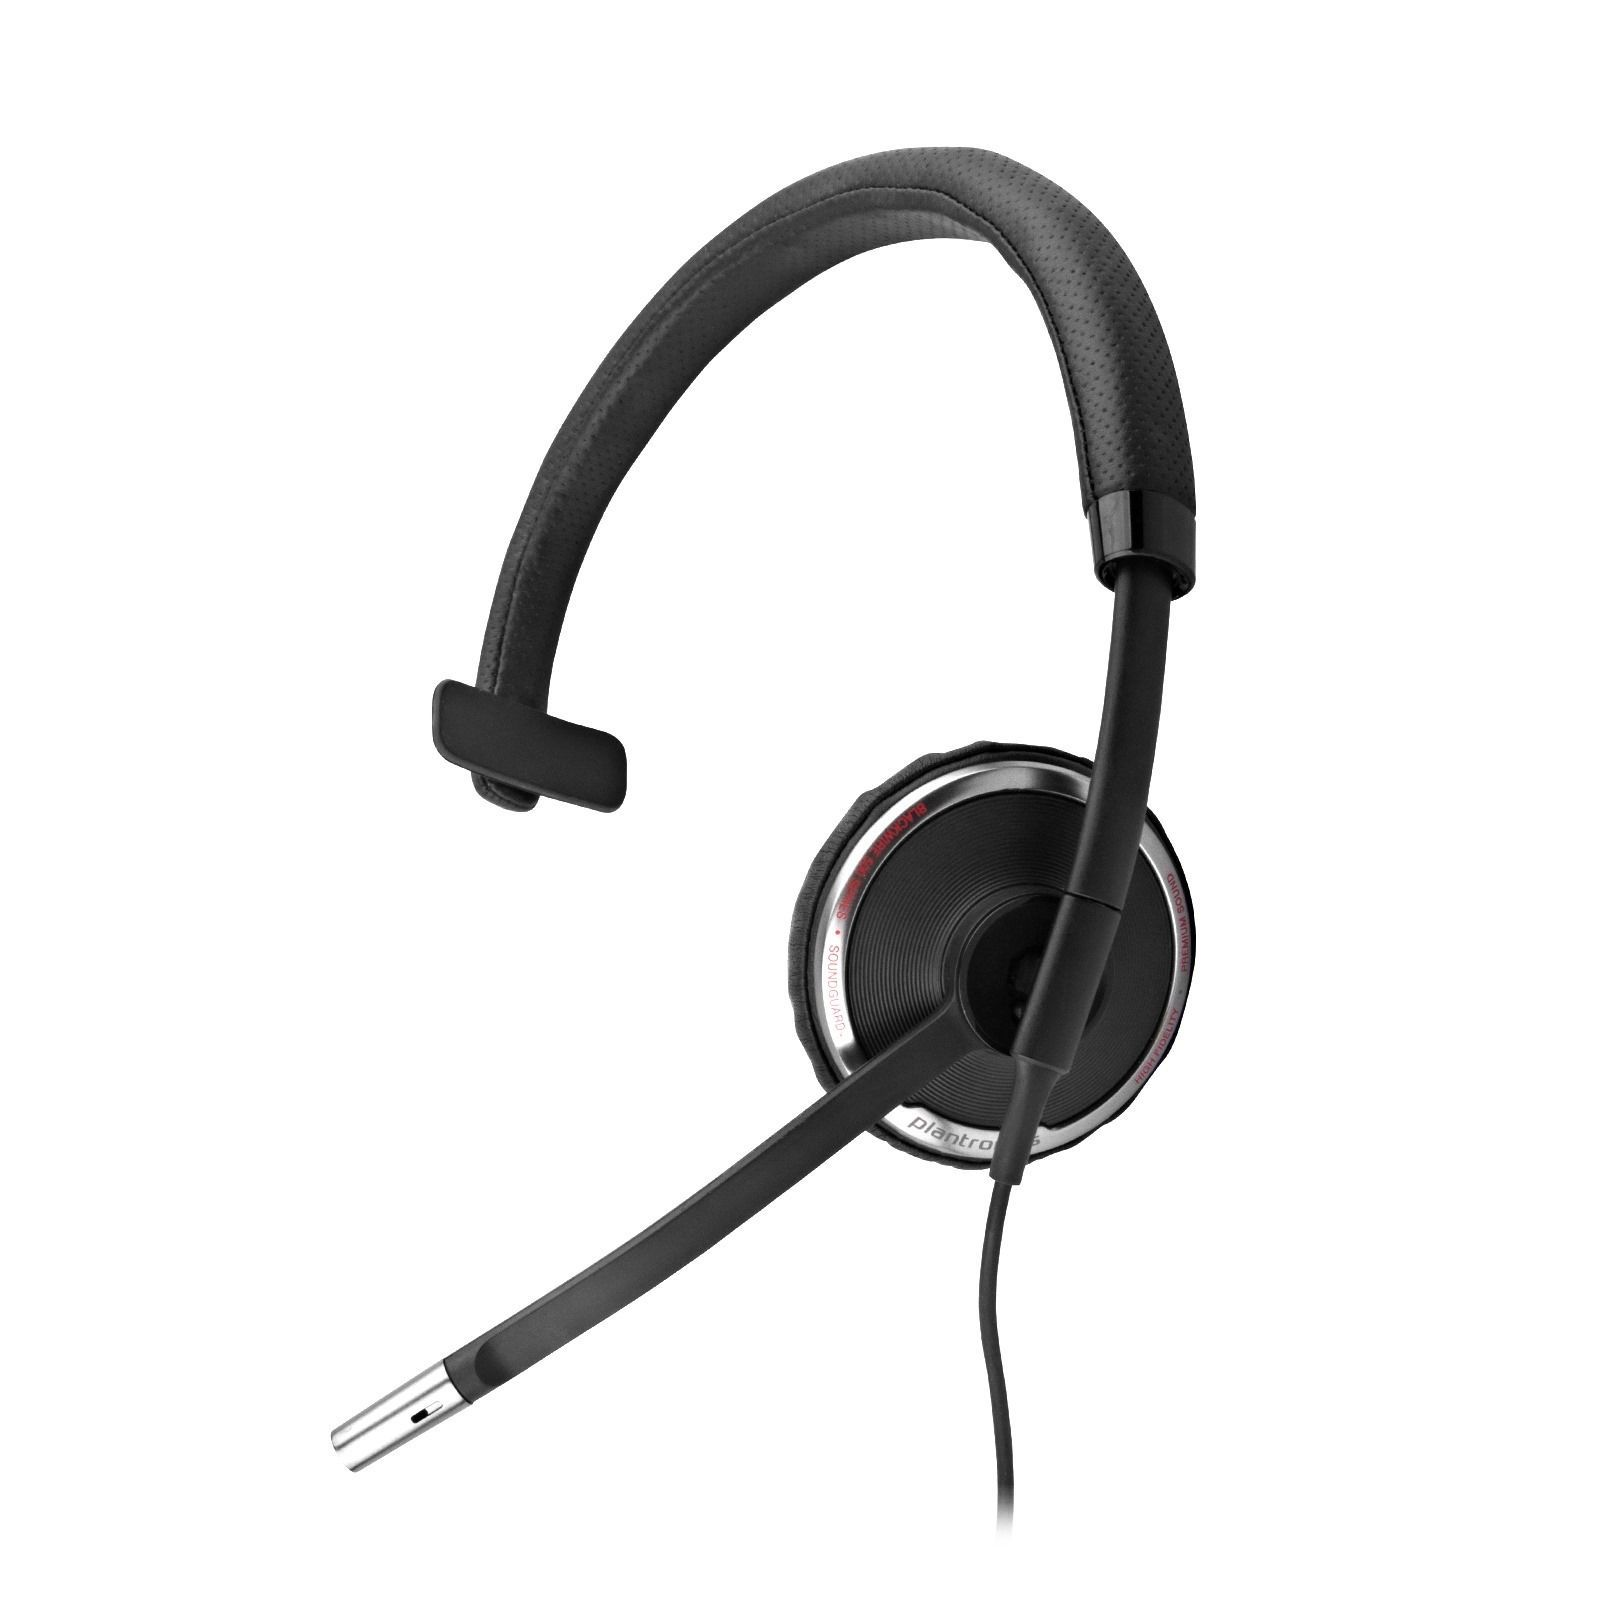 Plantronics Blackwire C510 Headband Uc Ready Enterprise Headset W Smart Sensor Plantronics Headset Computer Headsets